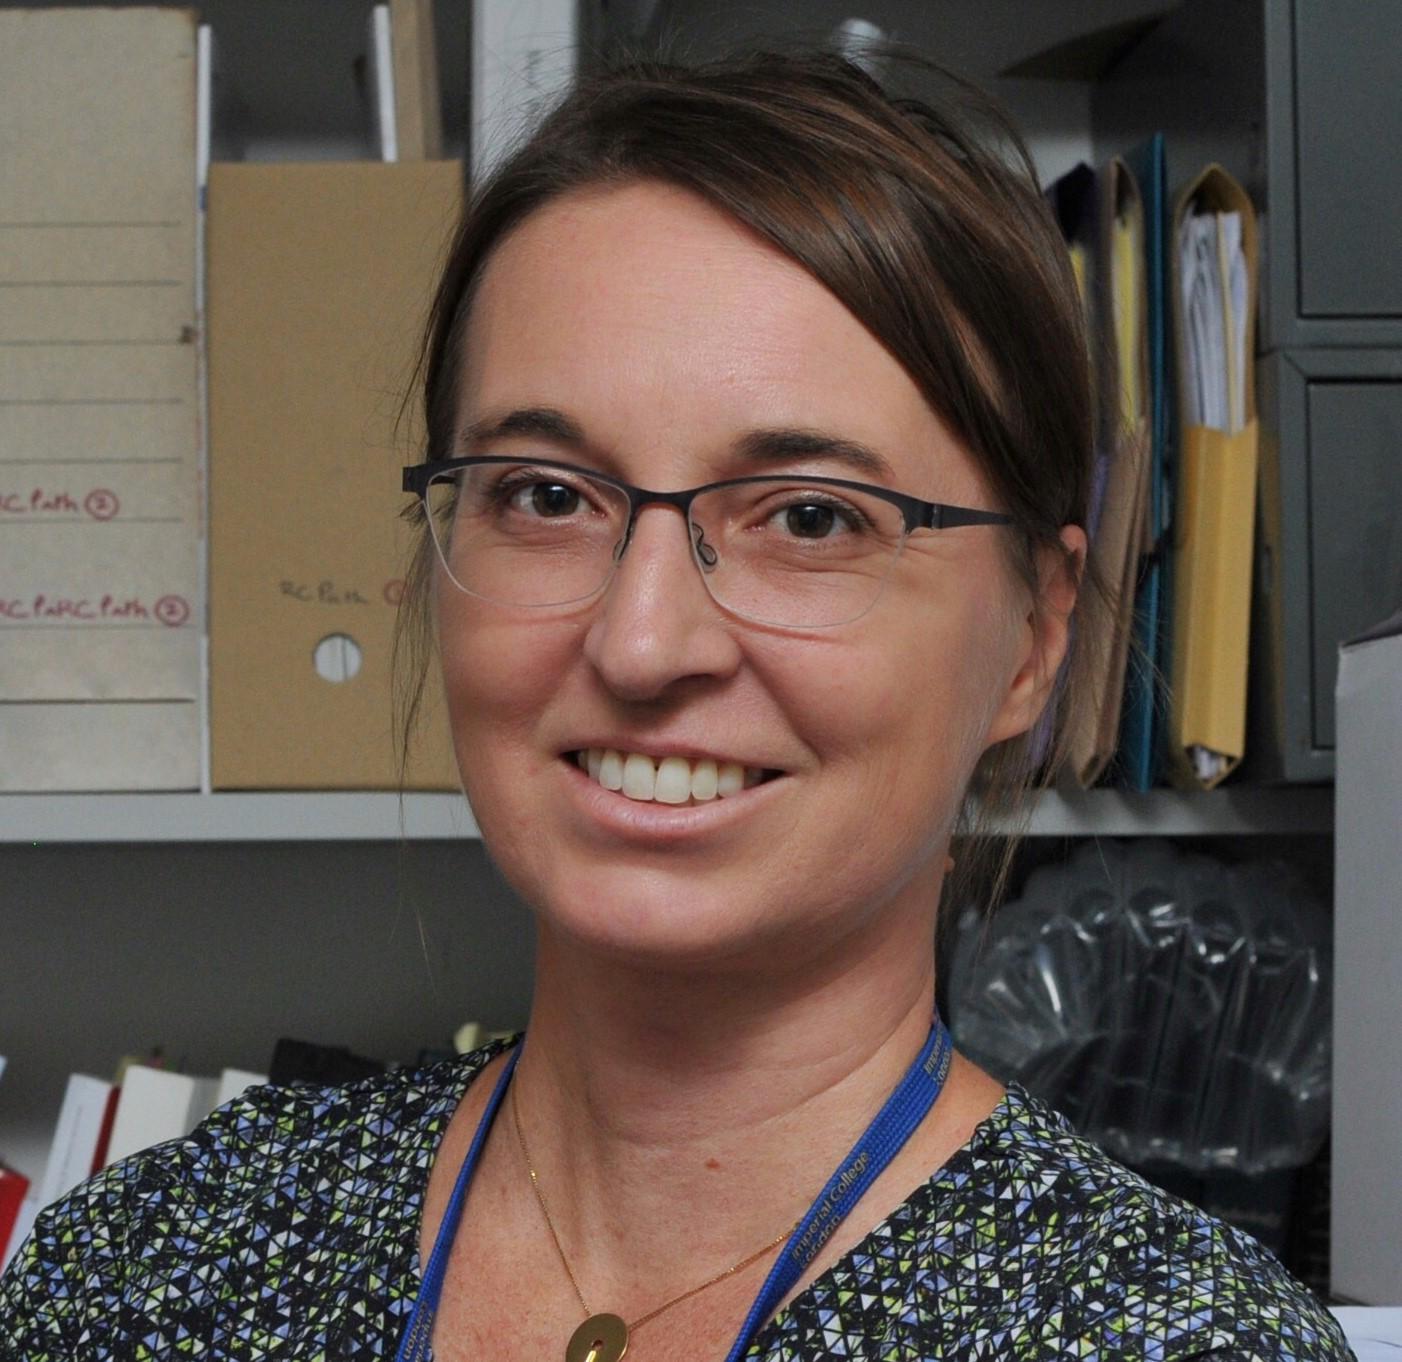 Candice Roufosse, M.D., Ph.D.